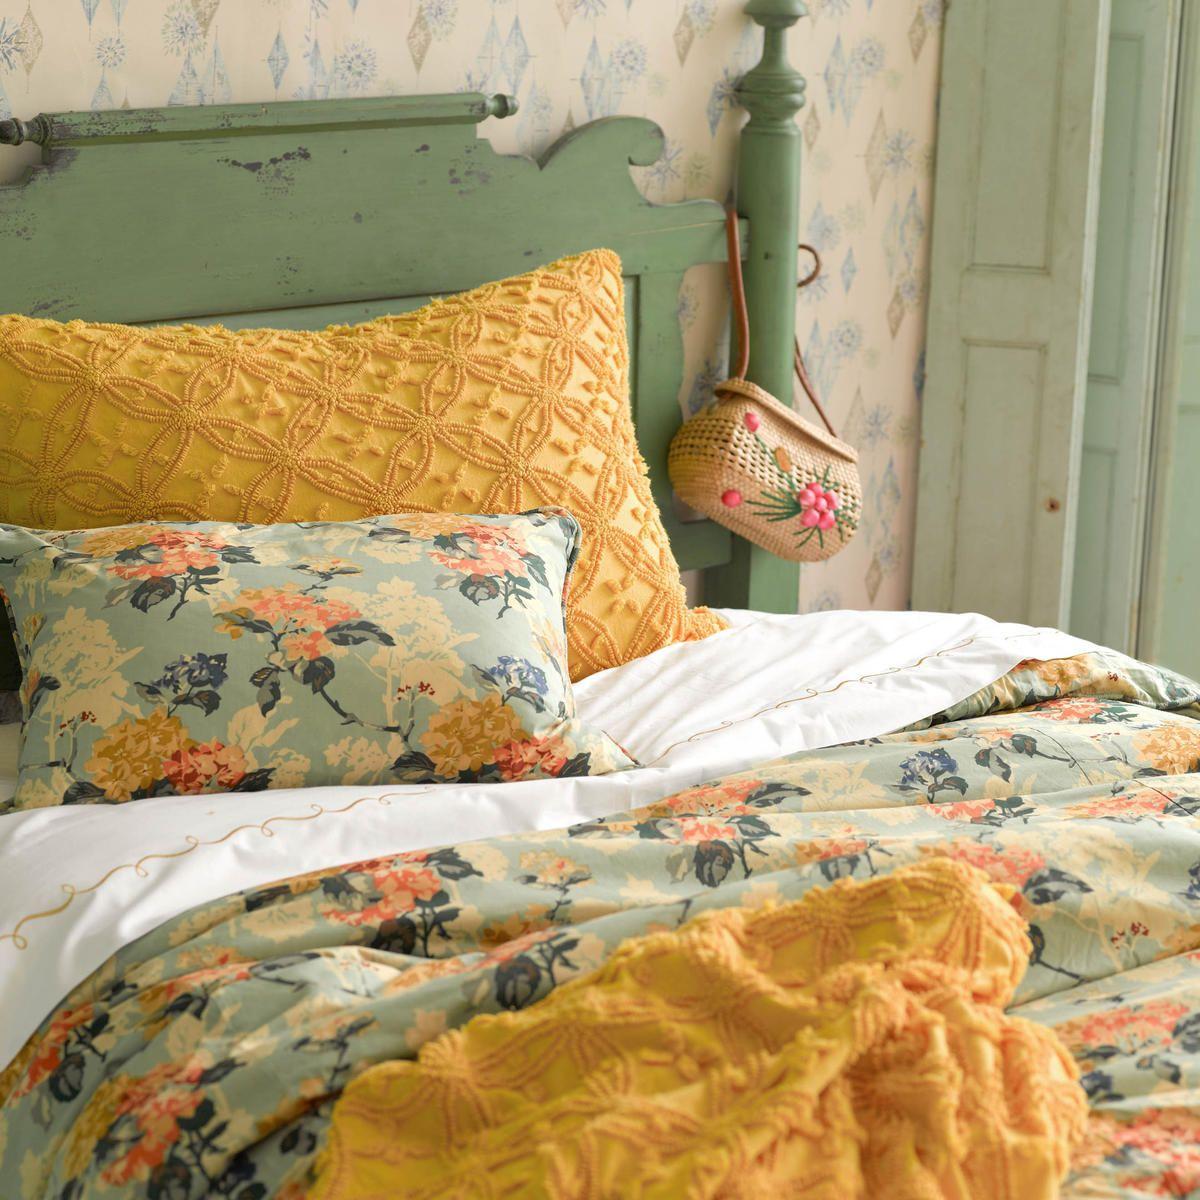 Copper Bedroom Accessories Master Bedroom Sets King Bedroom Design For Girls Hipster Bedroom Wallpaper: Love This Green Headboard! Love The Combination Of